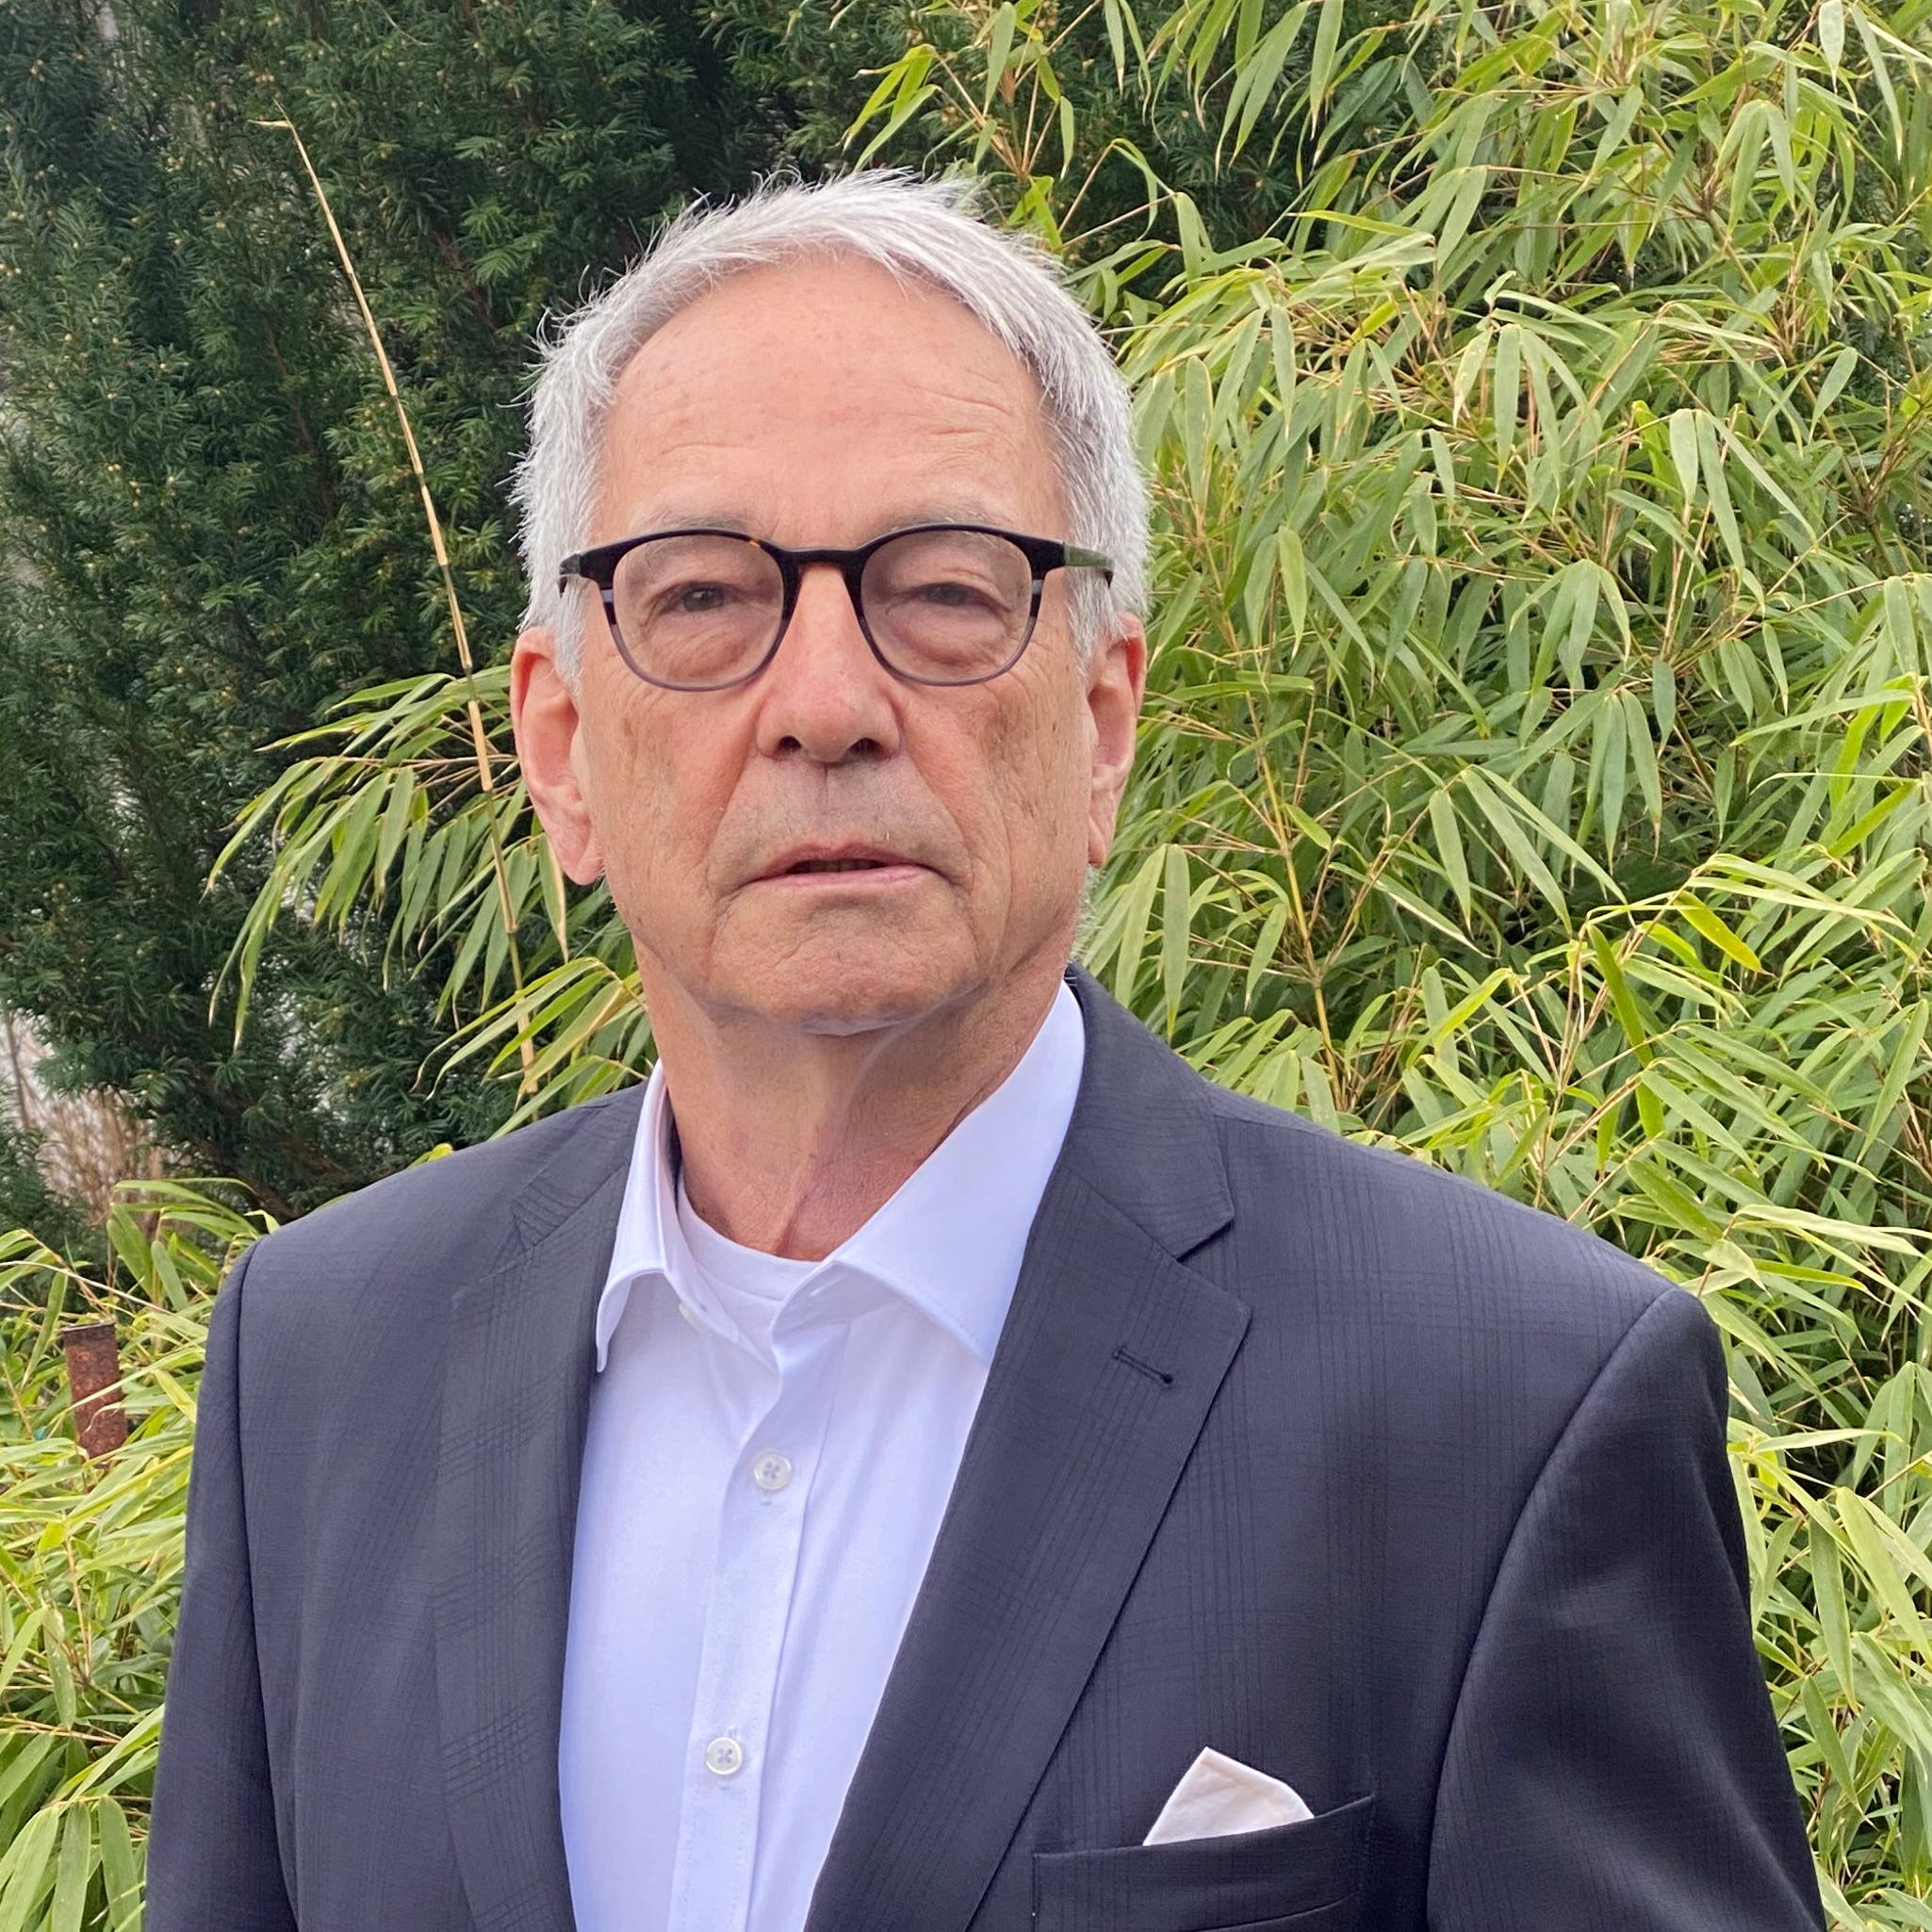 Günther Krug